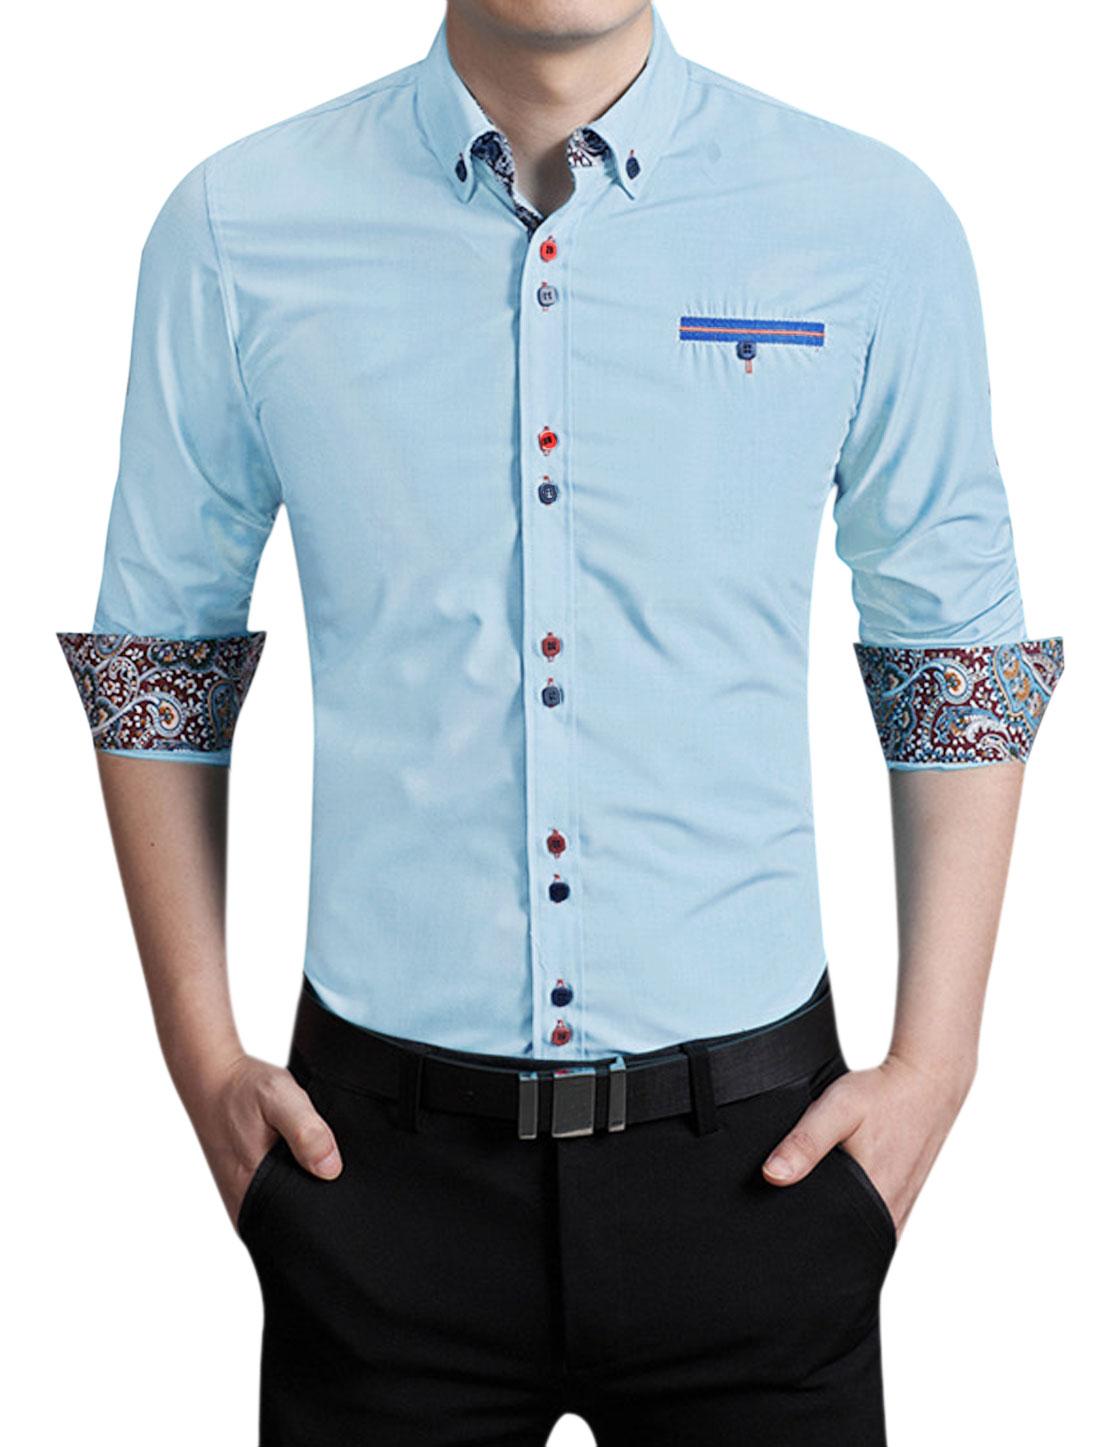 Men Long Sleeves Mock Pocket Button Closed Shirt Sky Blue M